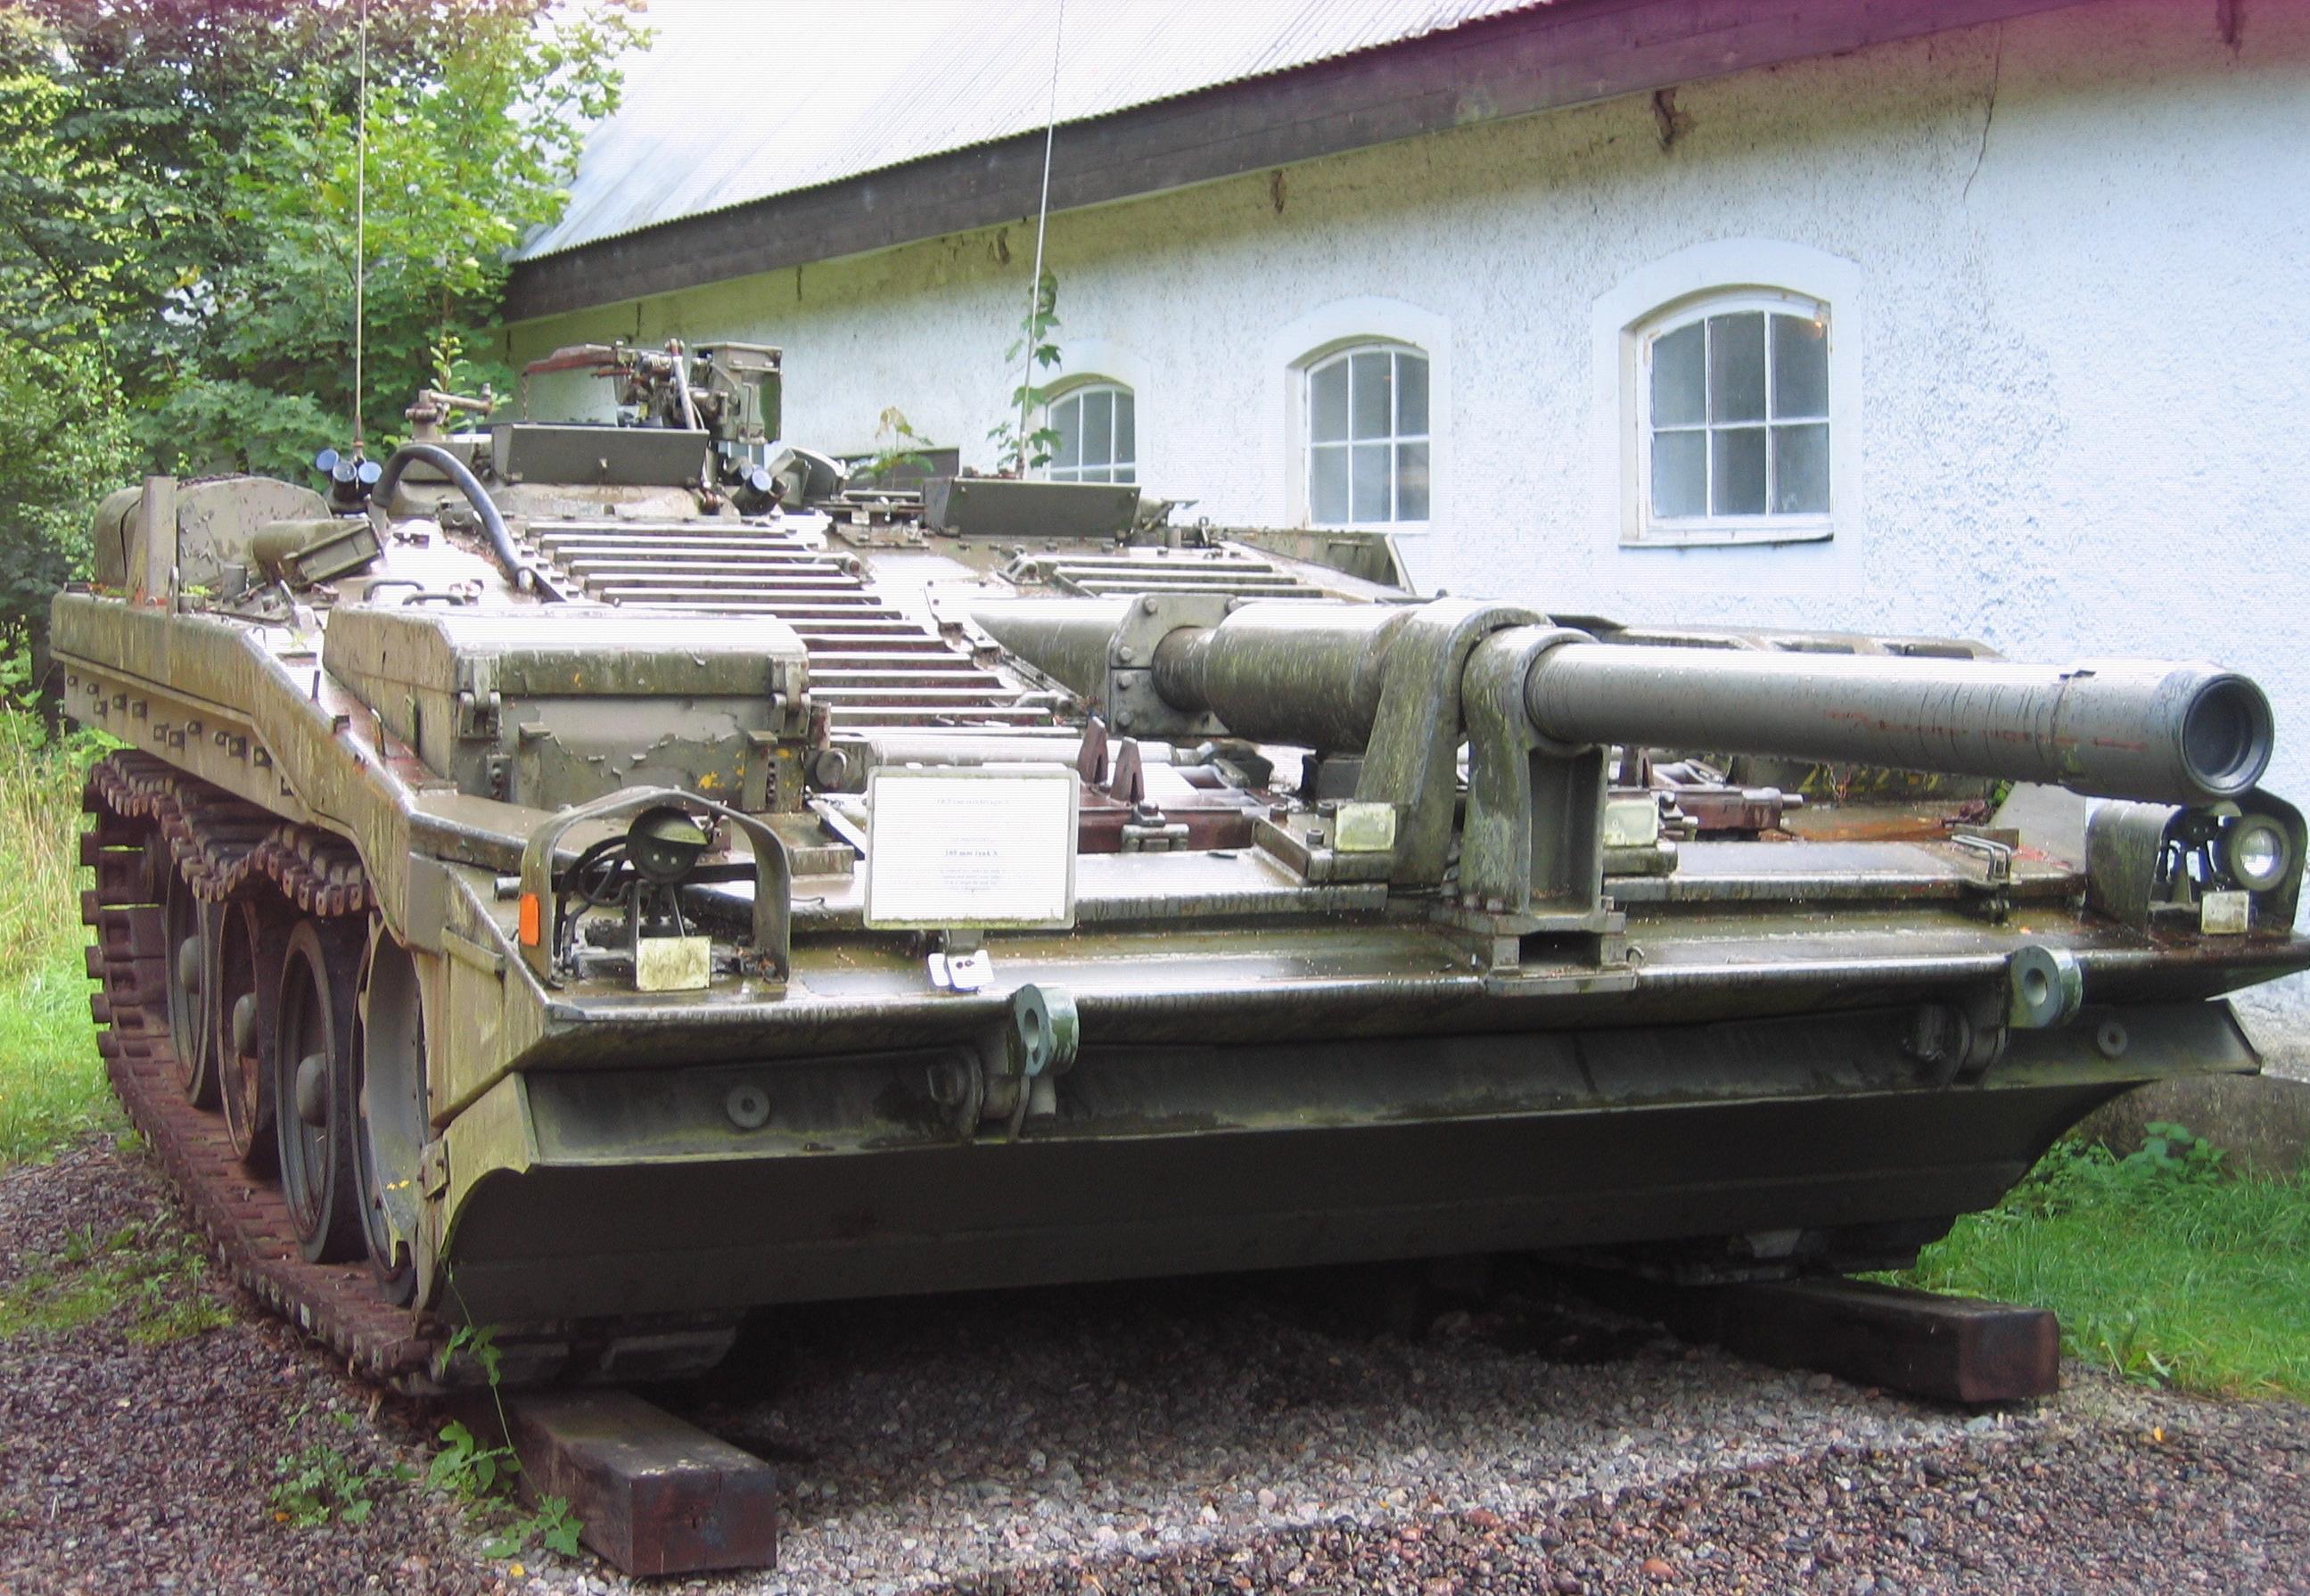 Sherman, A History of the American Medium Tank by H.R. Hinnicutt - (hb,1978,1st)